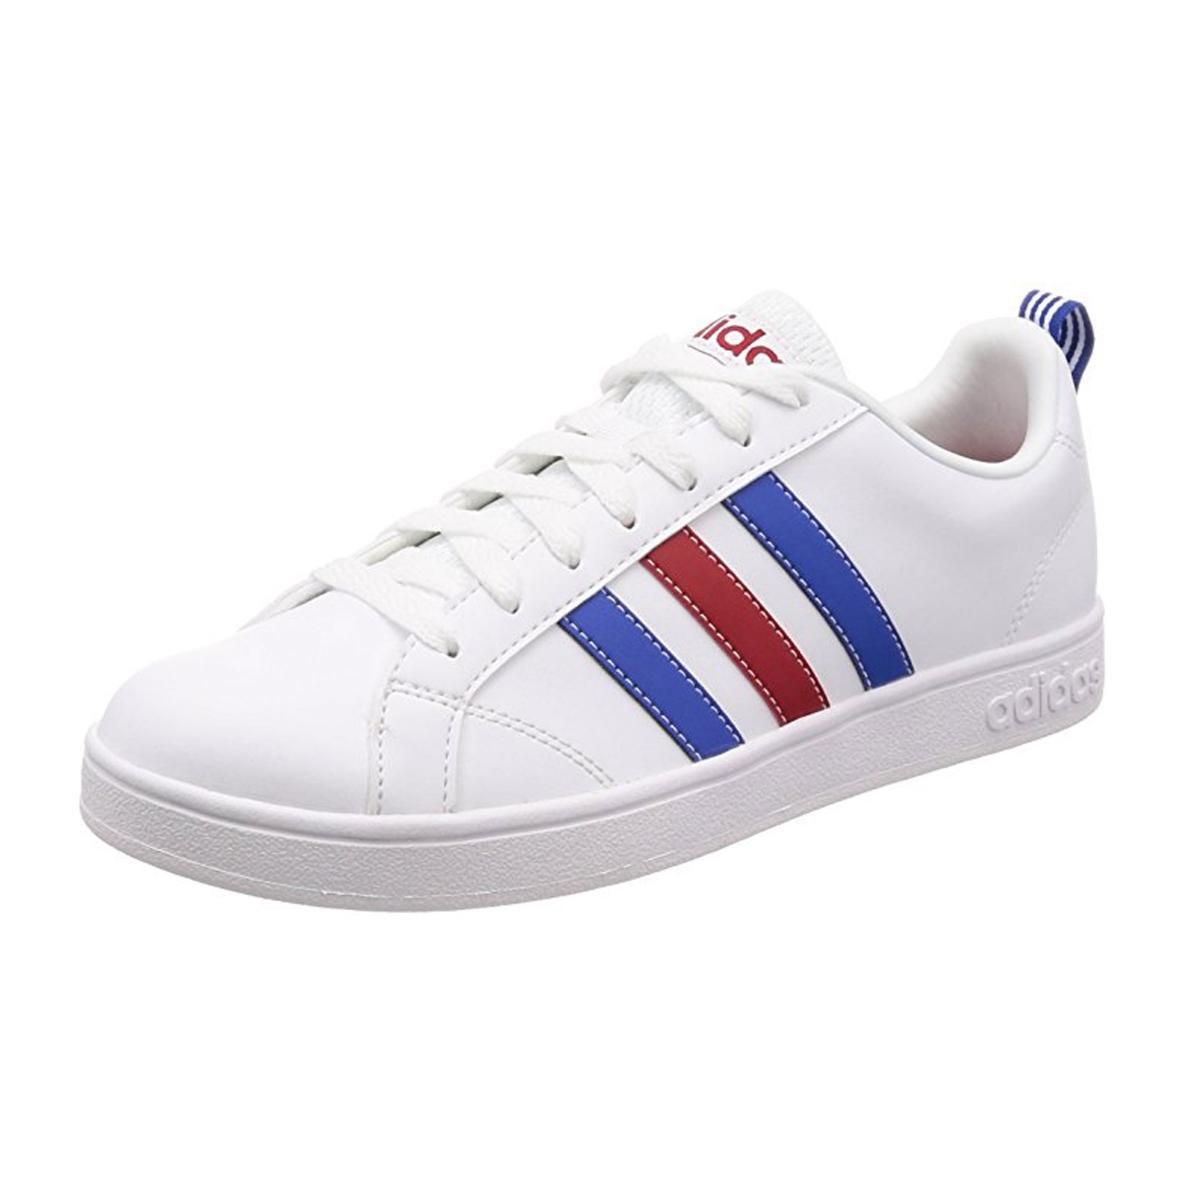 adidas scarpe sportive